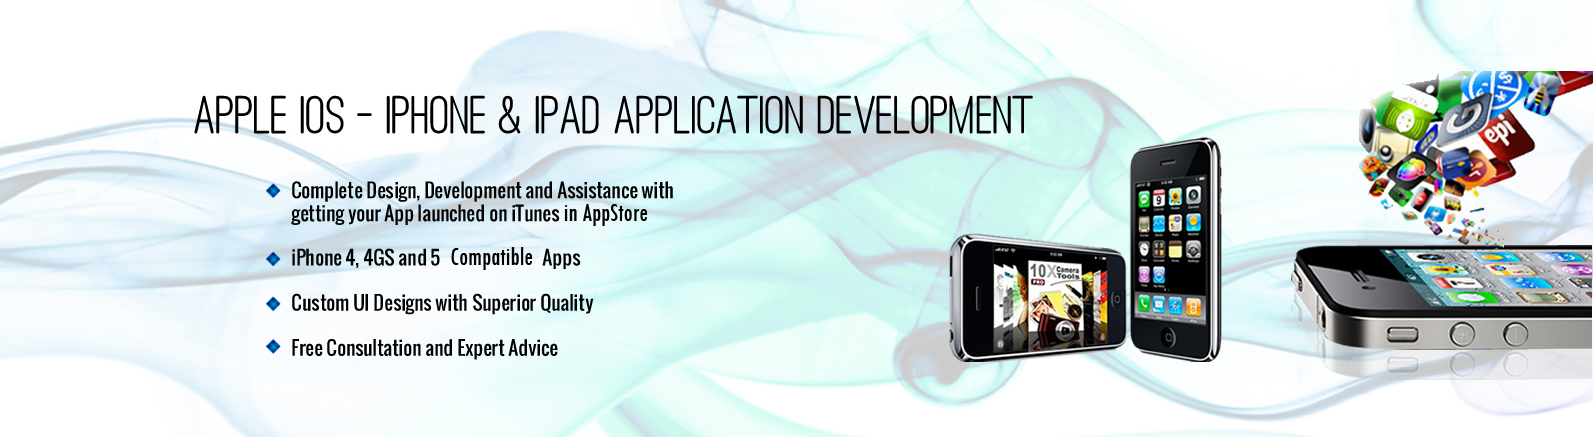 application-Development1